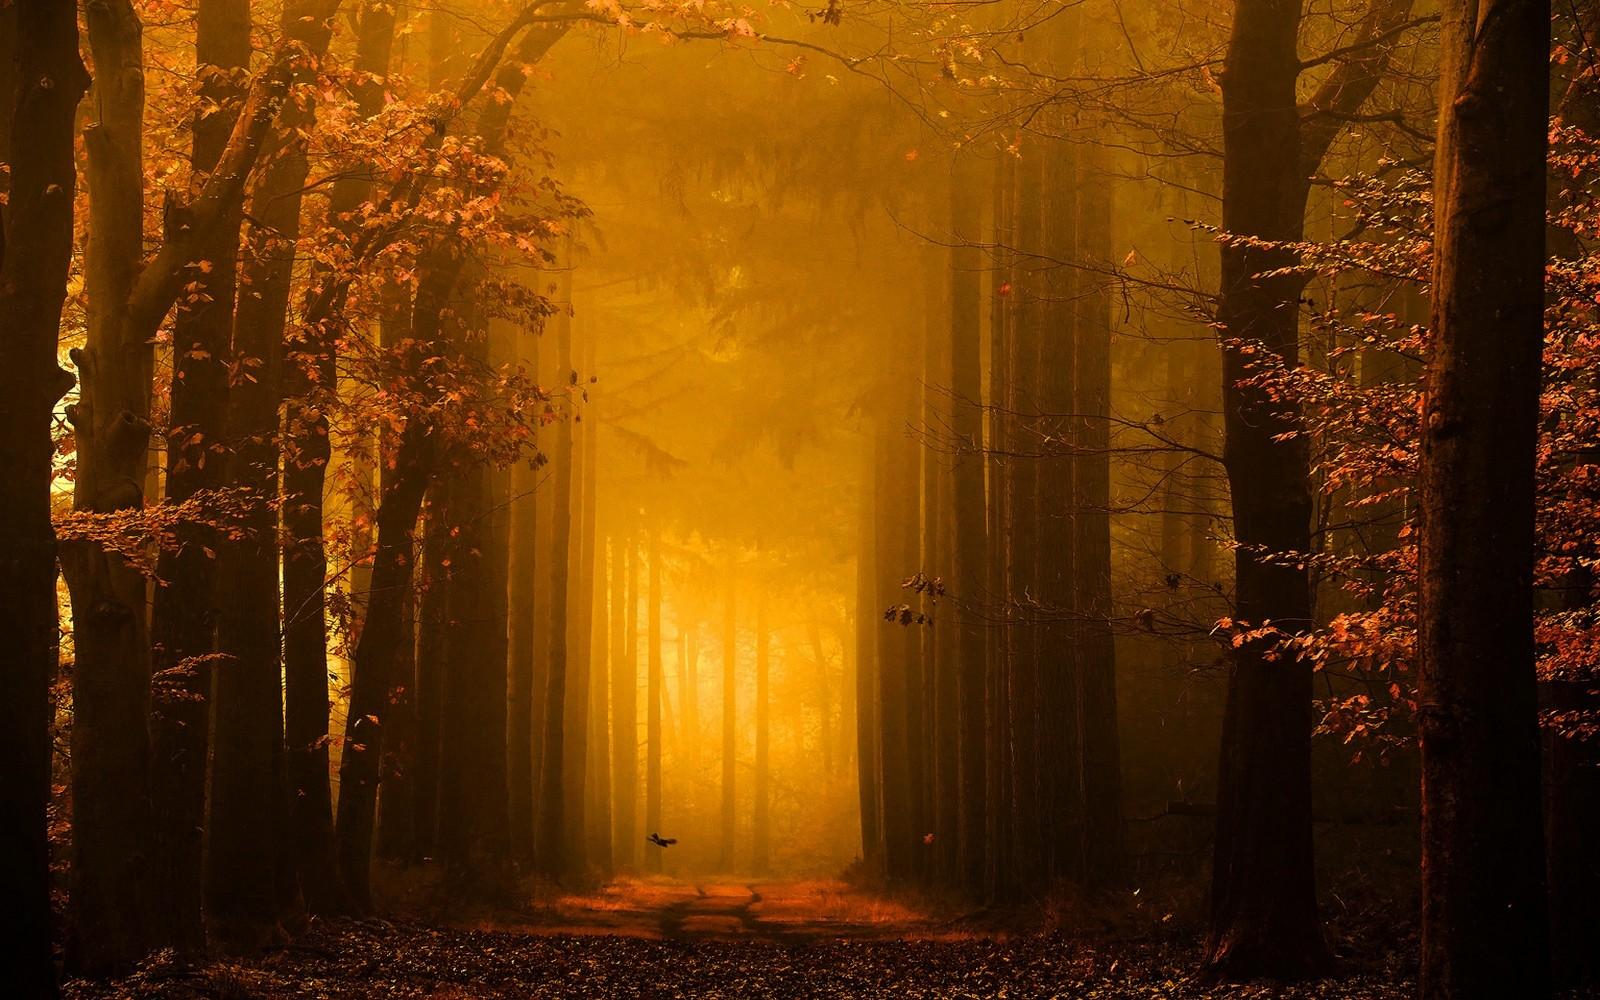 Wallpaper Sunlight Trees Landscape Forest Fall